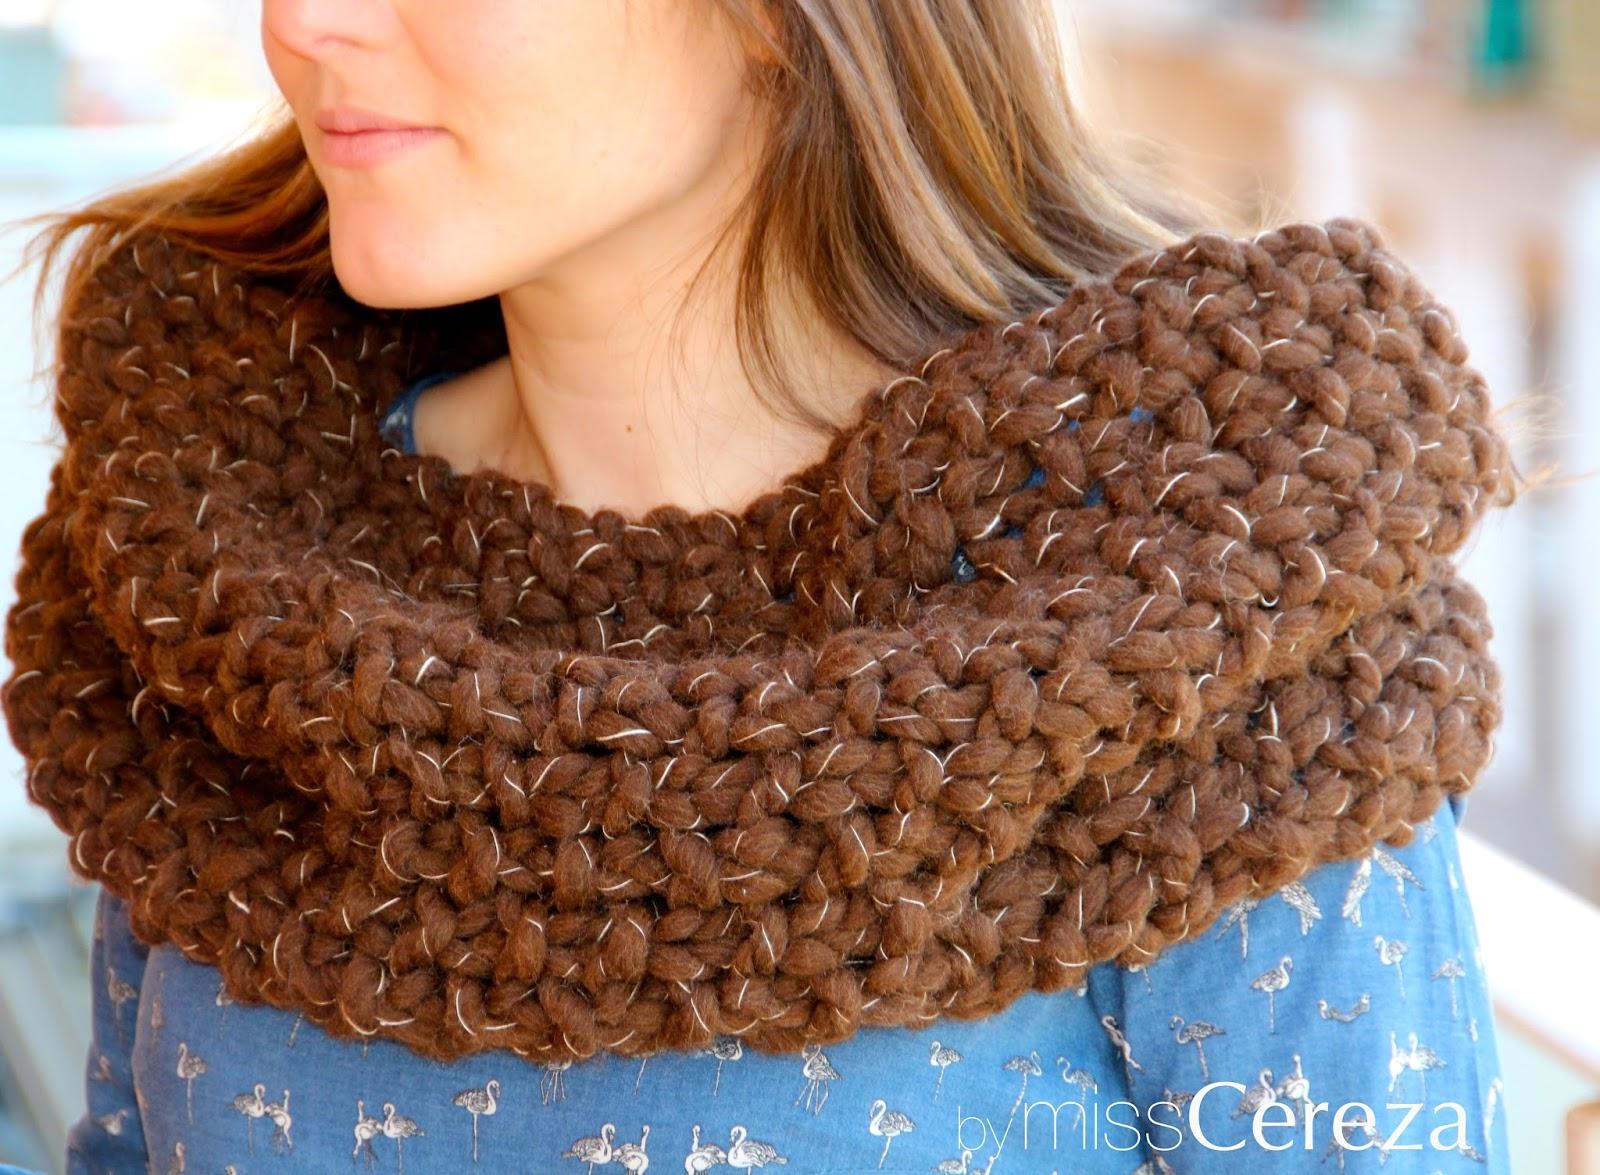 bufanda de lana natural